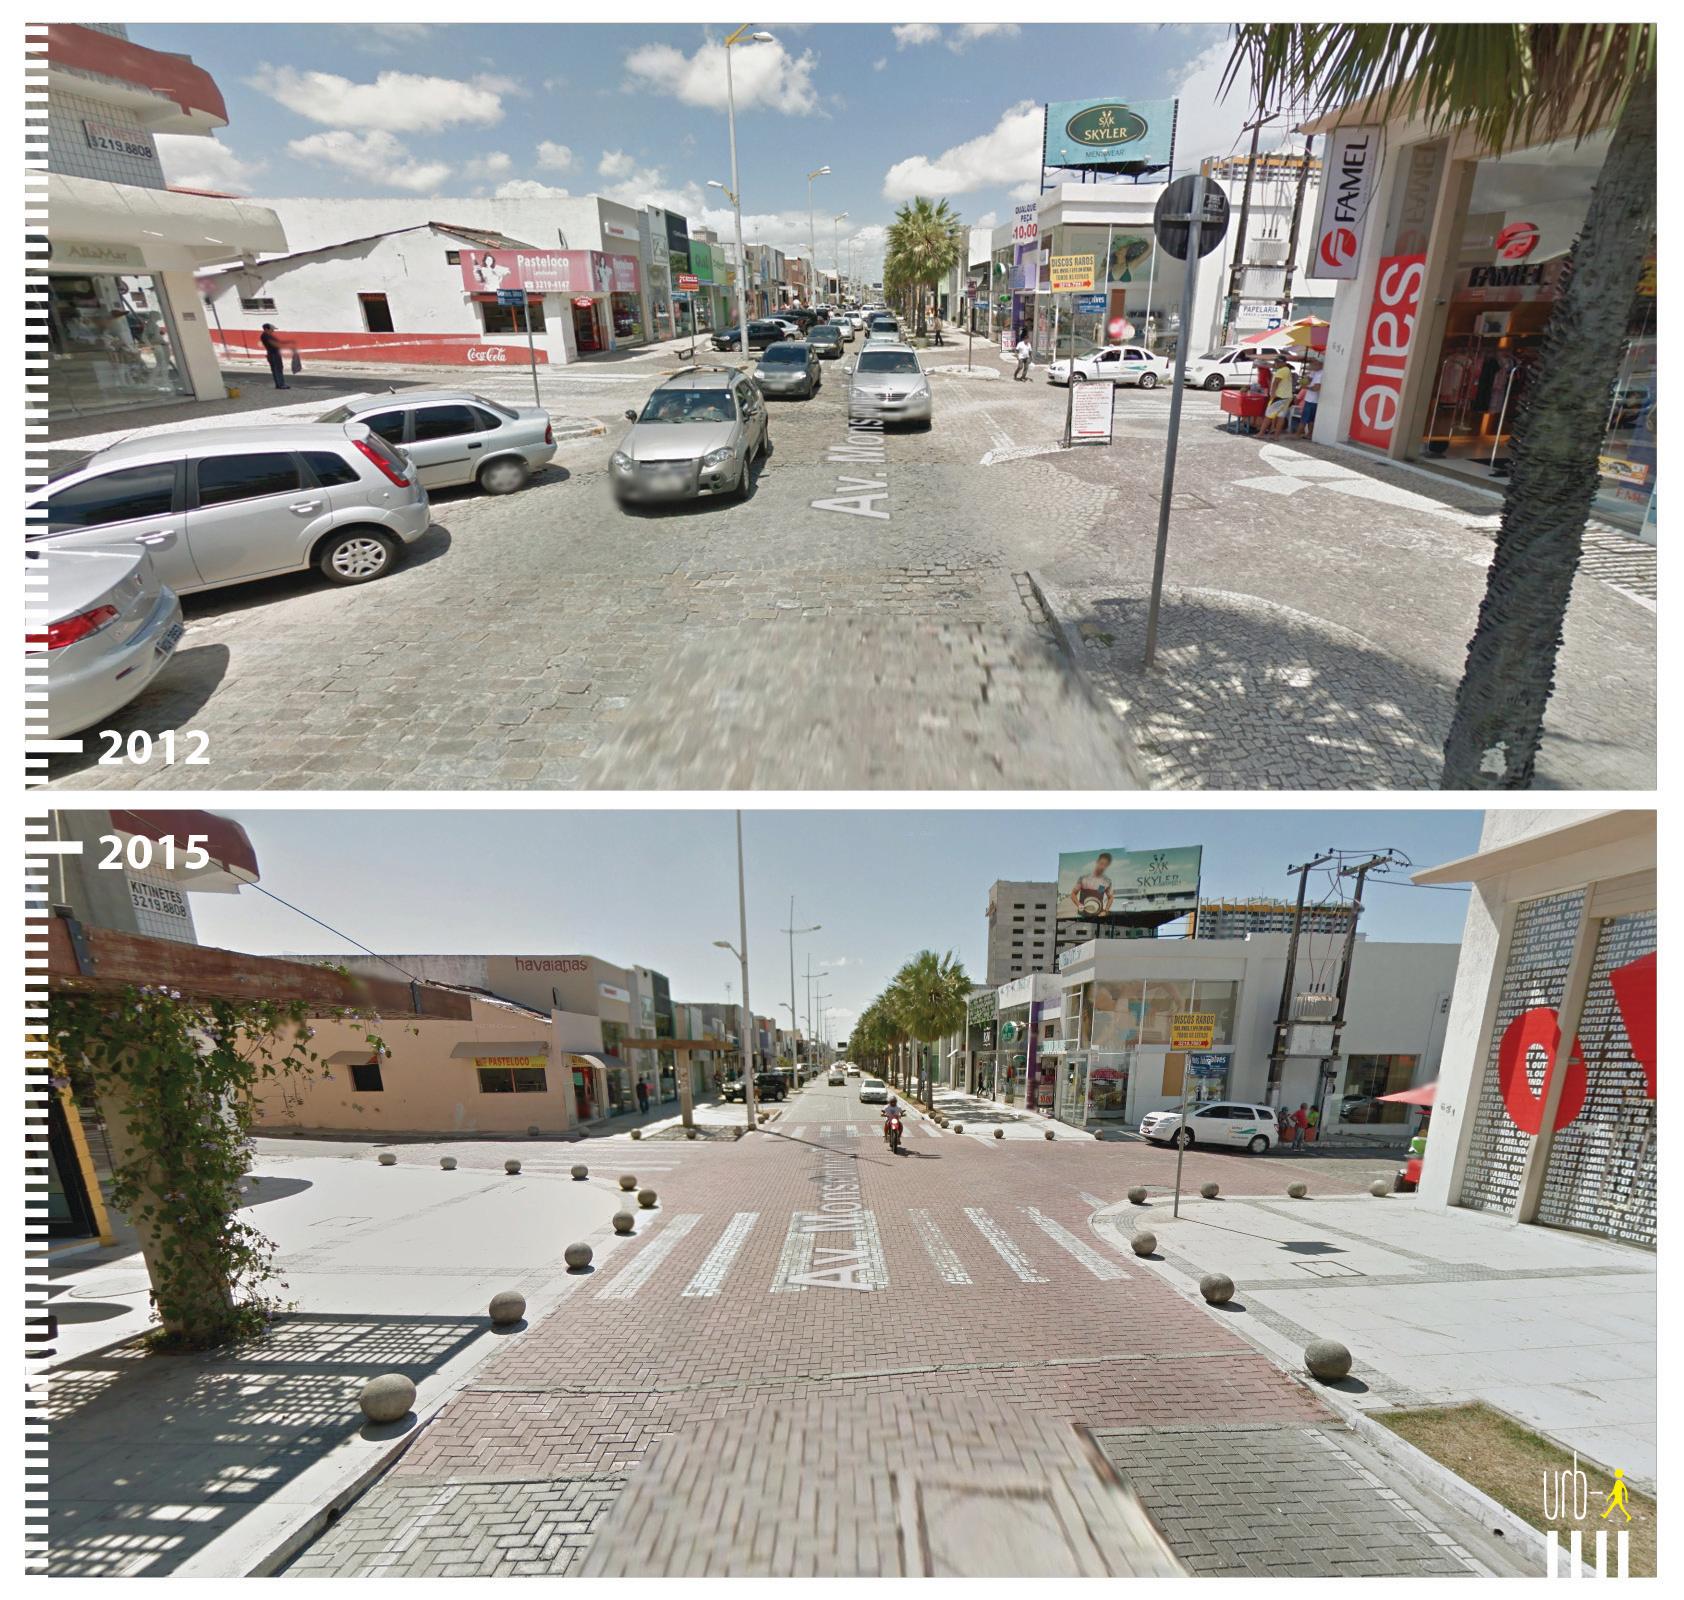 1334 BR Fortaleza, Avenida Monsenhor Tabosa